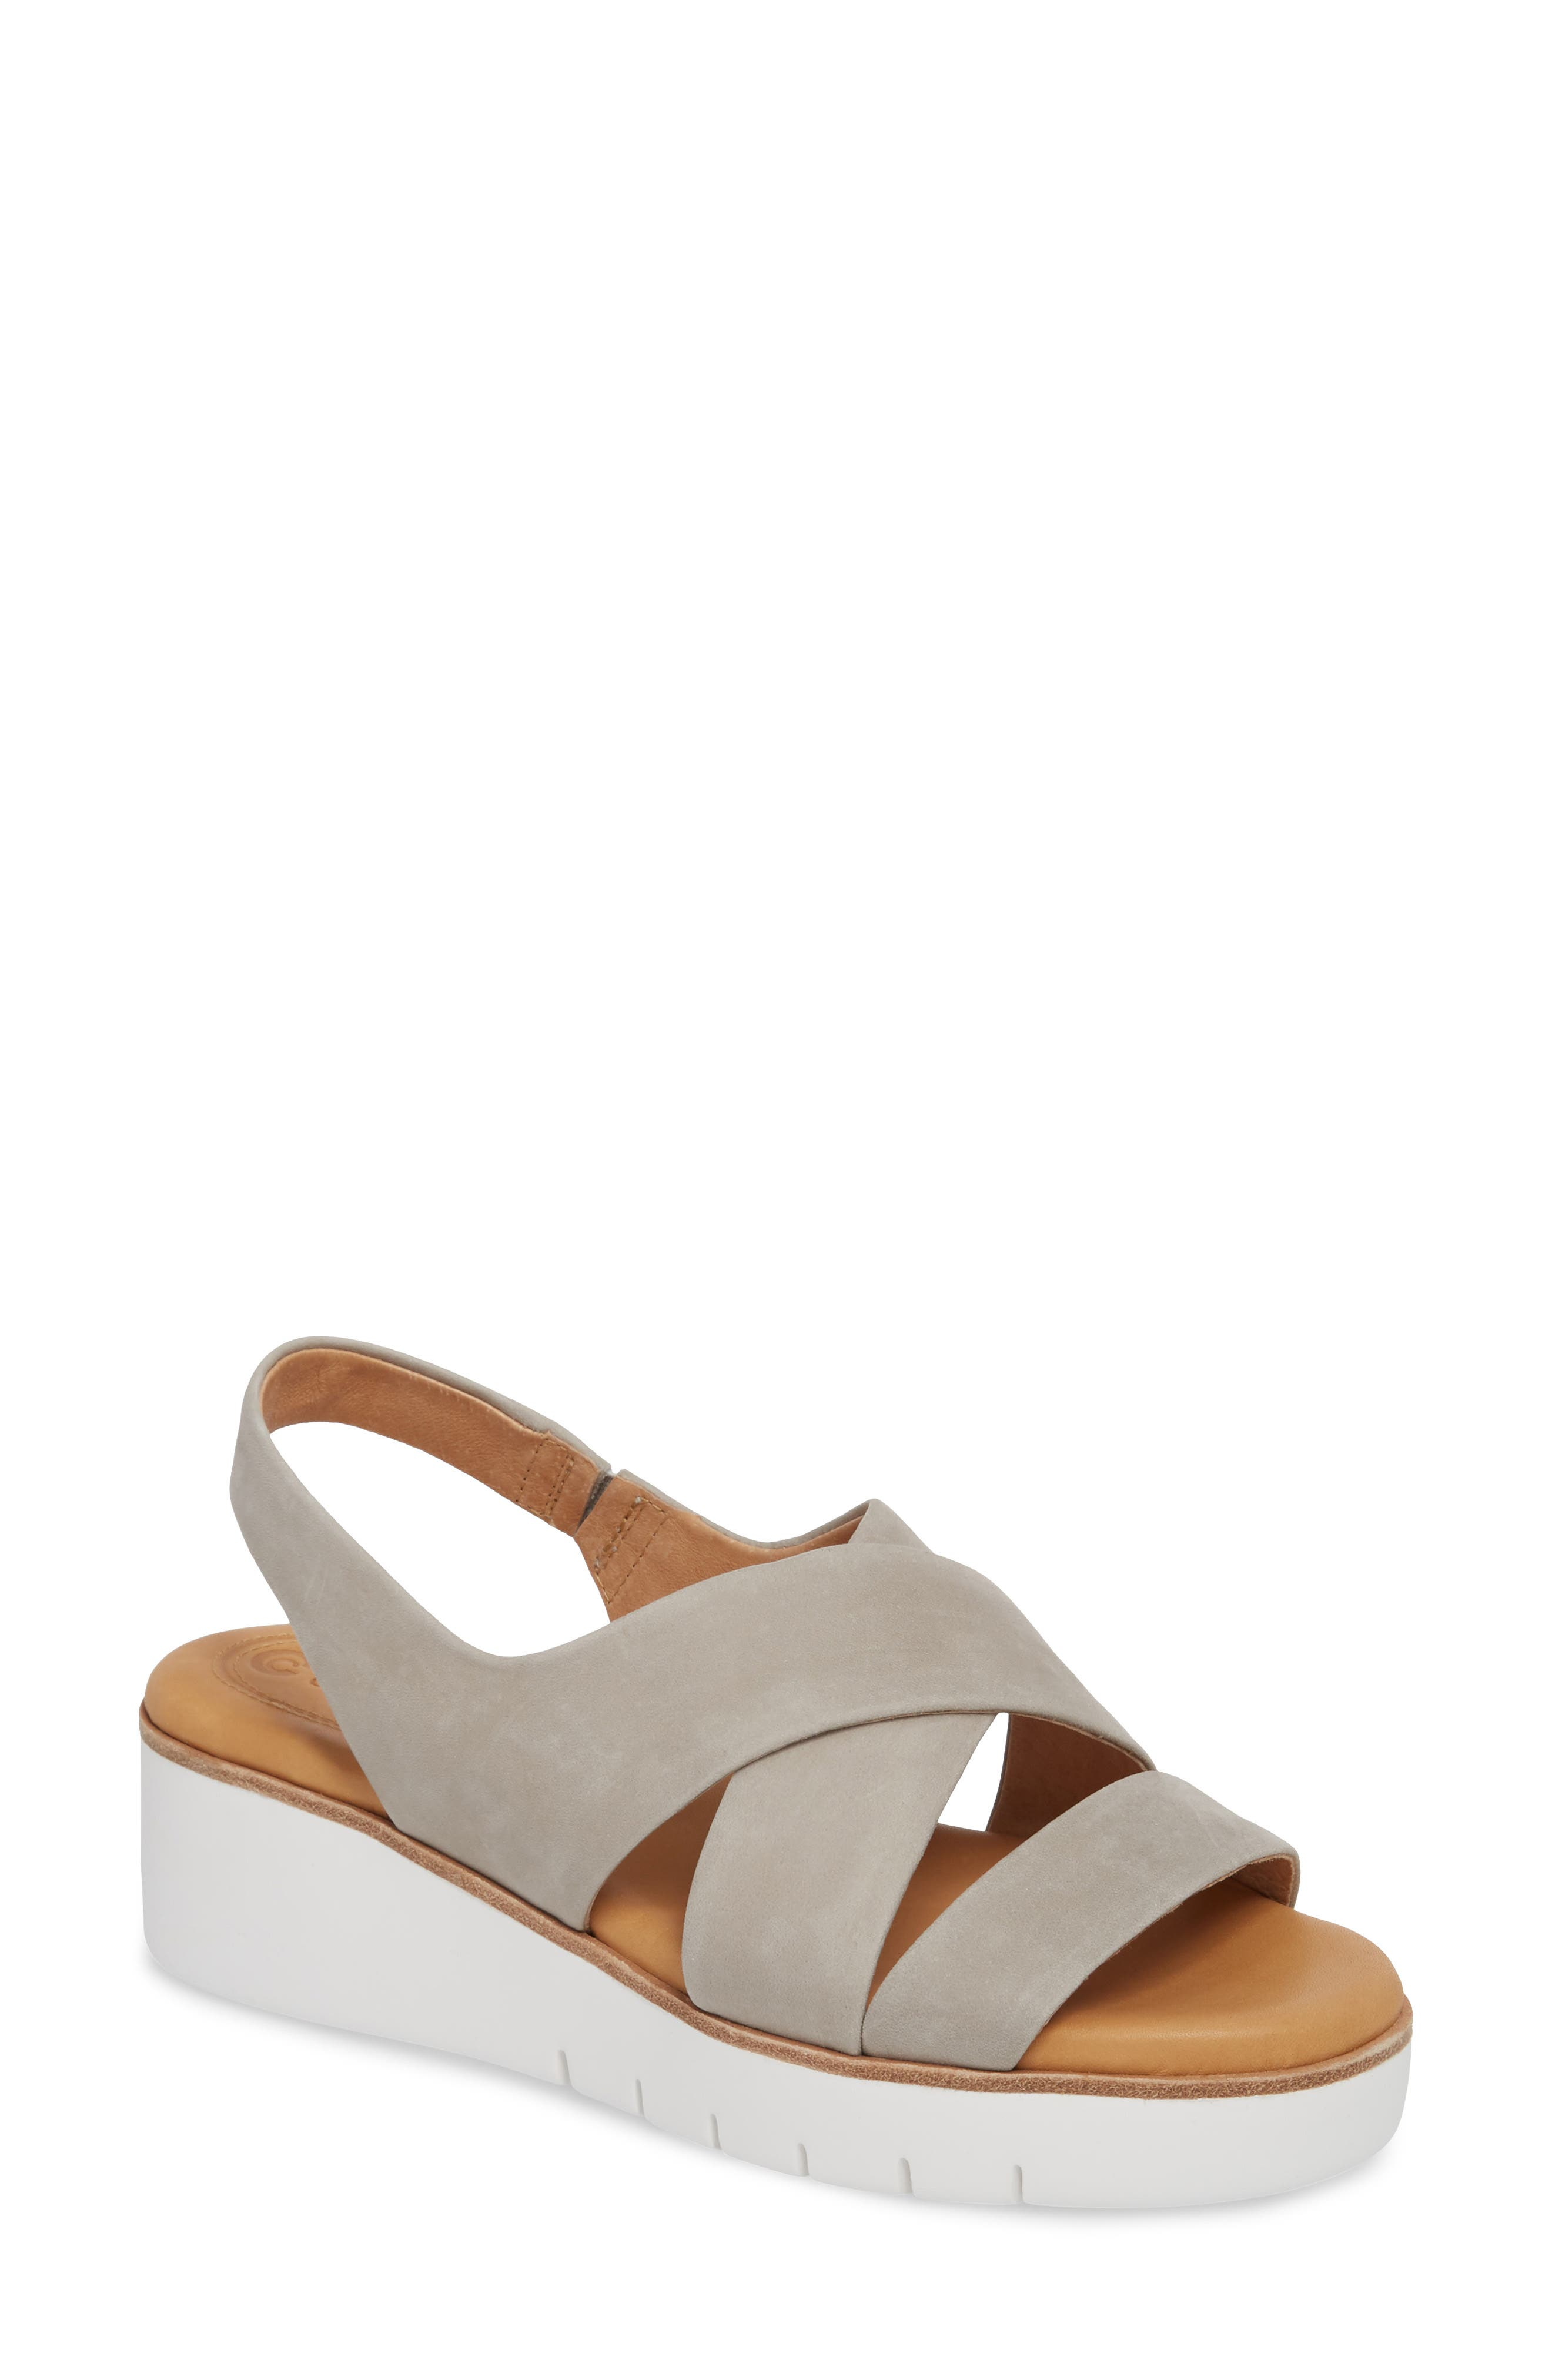 Cc Corso Como Brinney Wedge Sandal, Grey